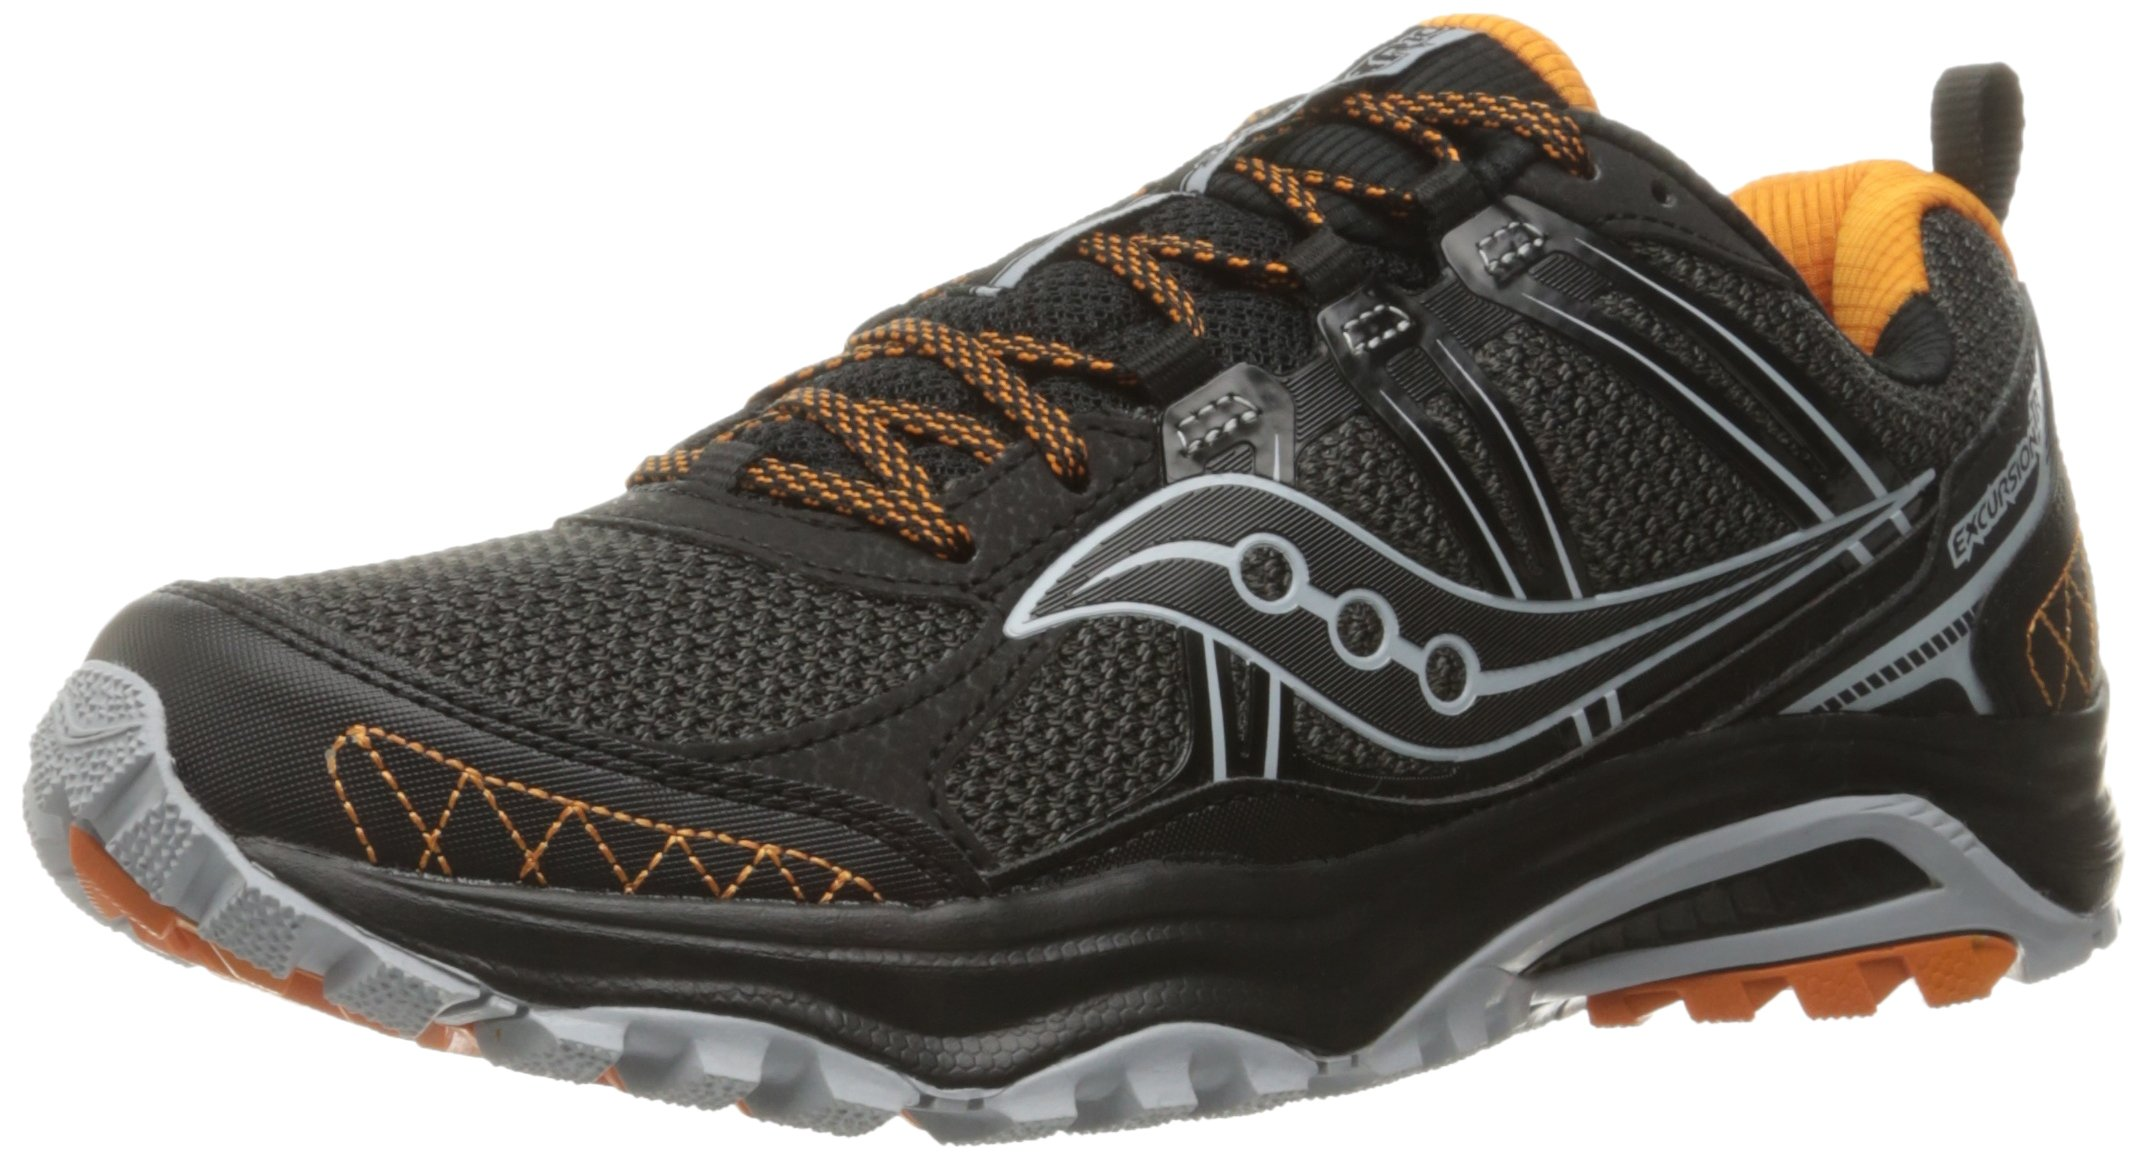 Saucony Men's Grid Excursion tr10 Trail Runner Grey/Black/Orange 8 M US by Saucony (Image #1)